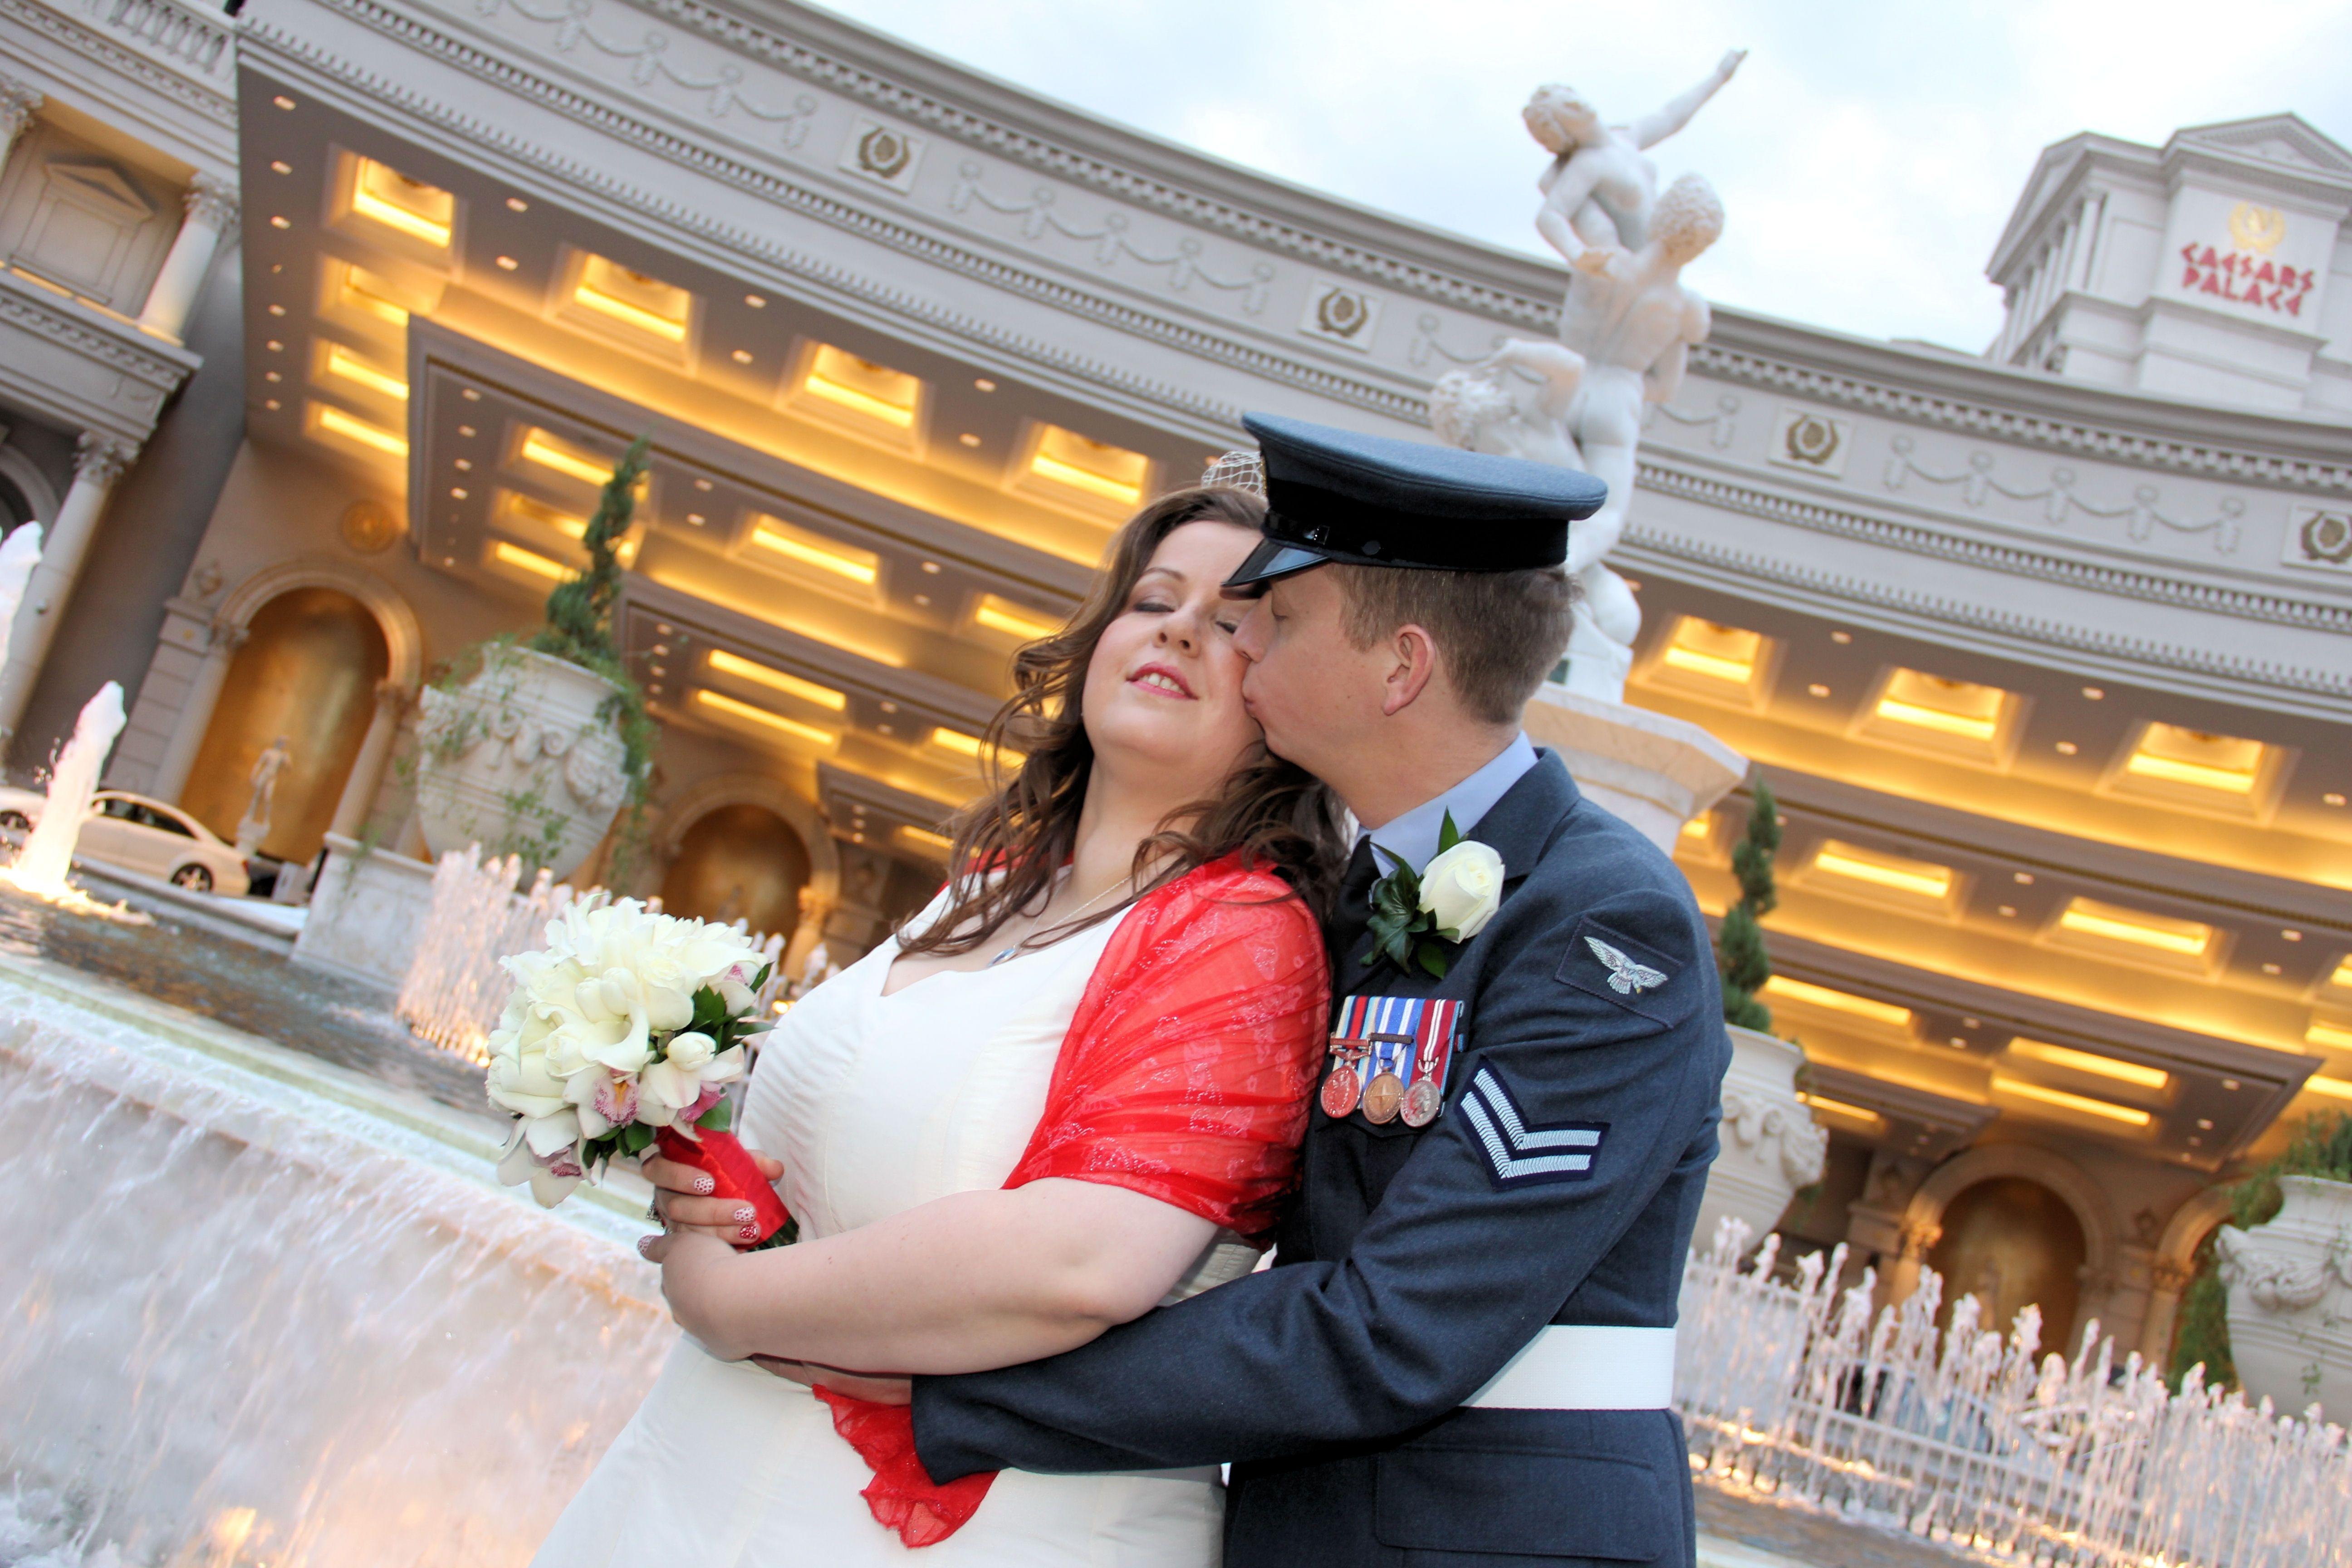 Vegas romance wedding Wedding, Ceremony, Romance